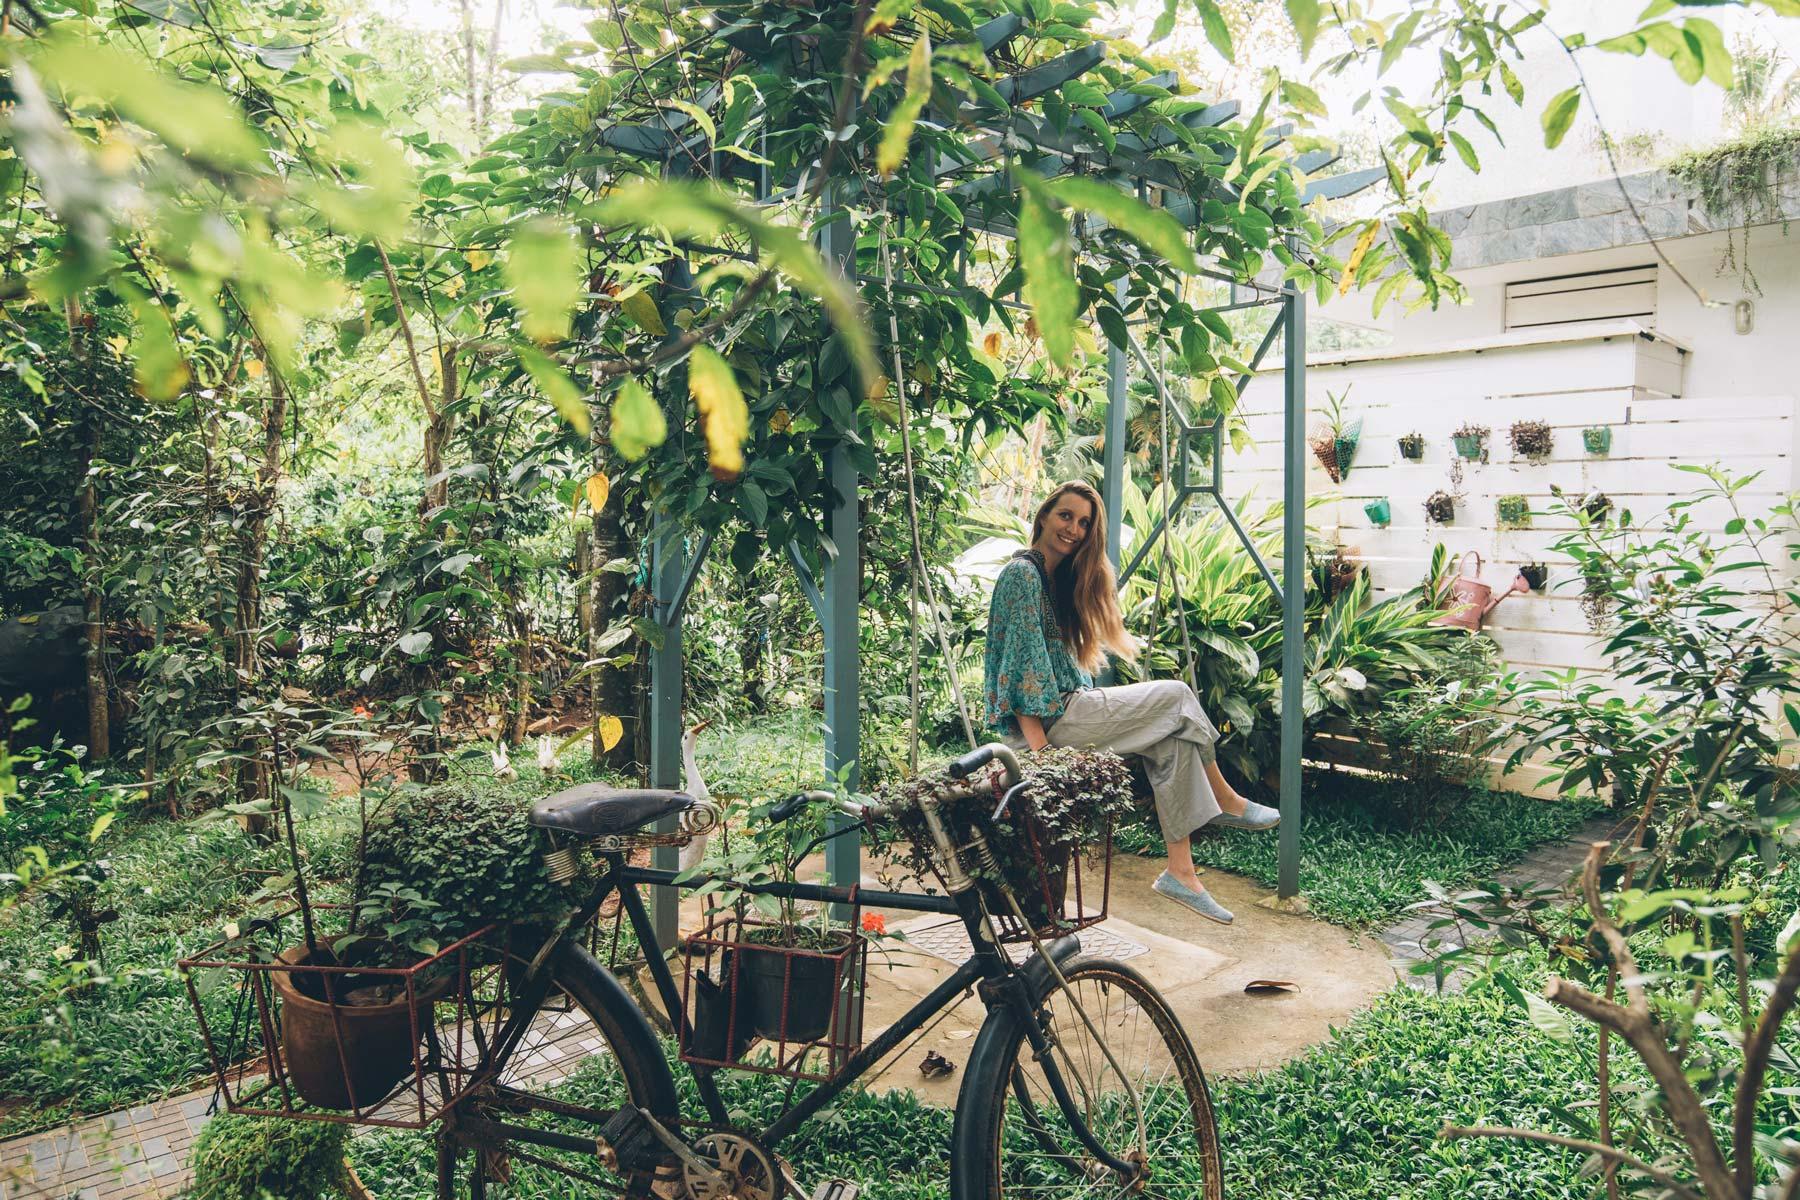 Home Stay, Munnar, Kerala